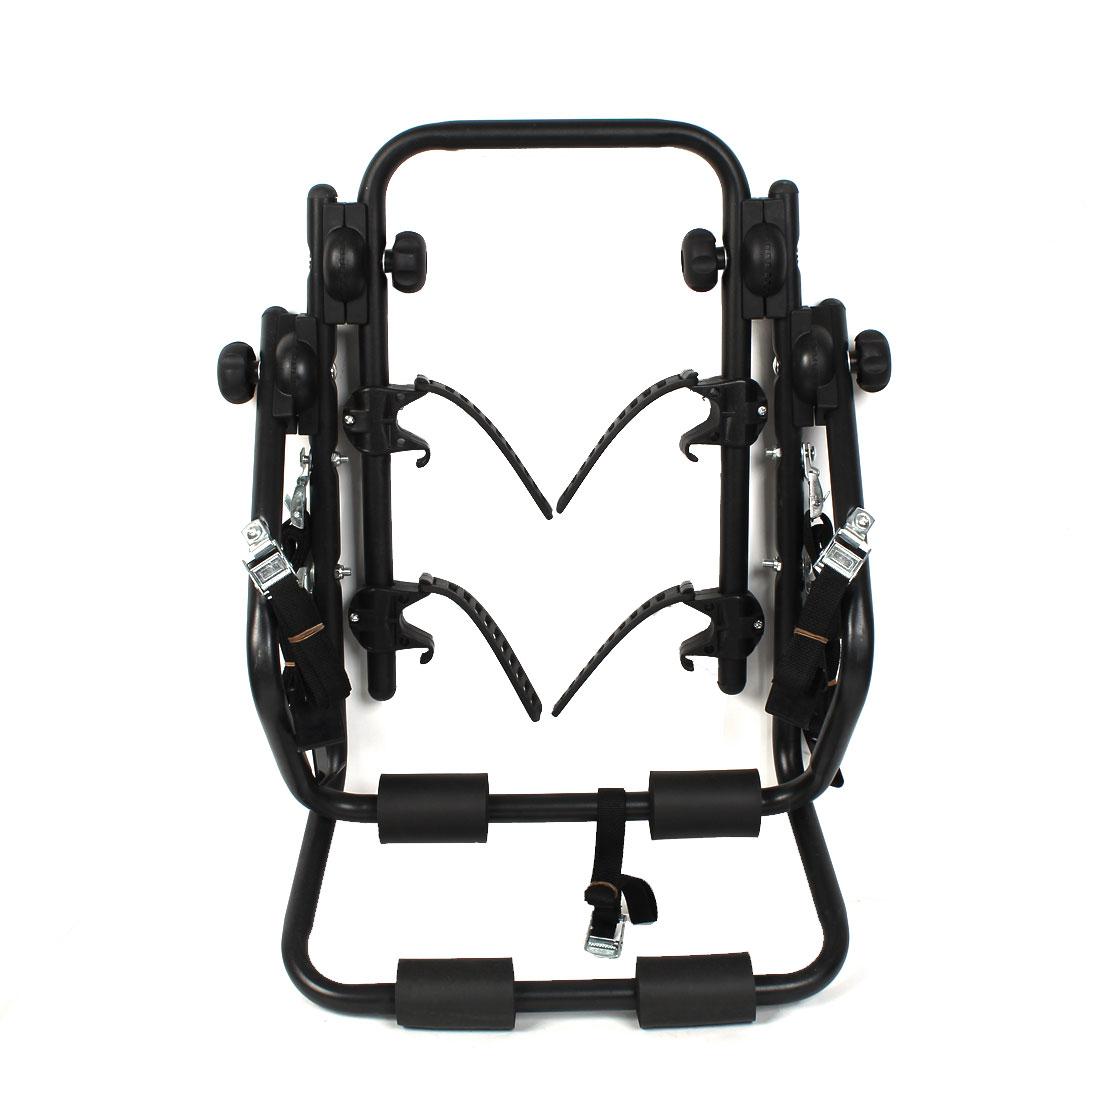 Mountain Bike Bicycle Car Rear Rack Carrier Holder Black